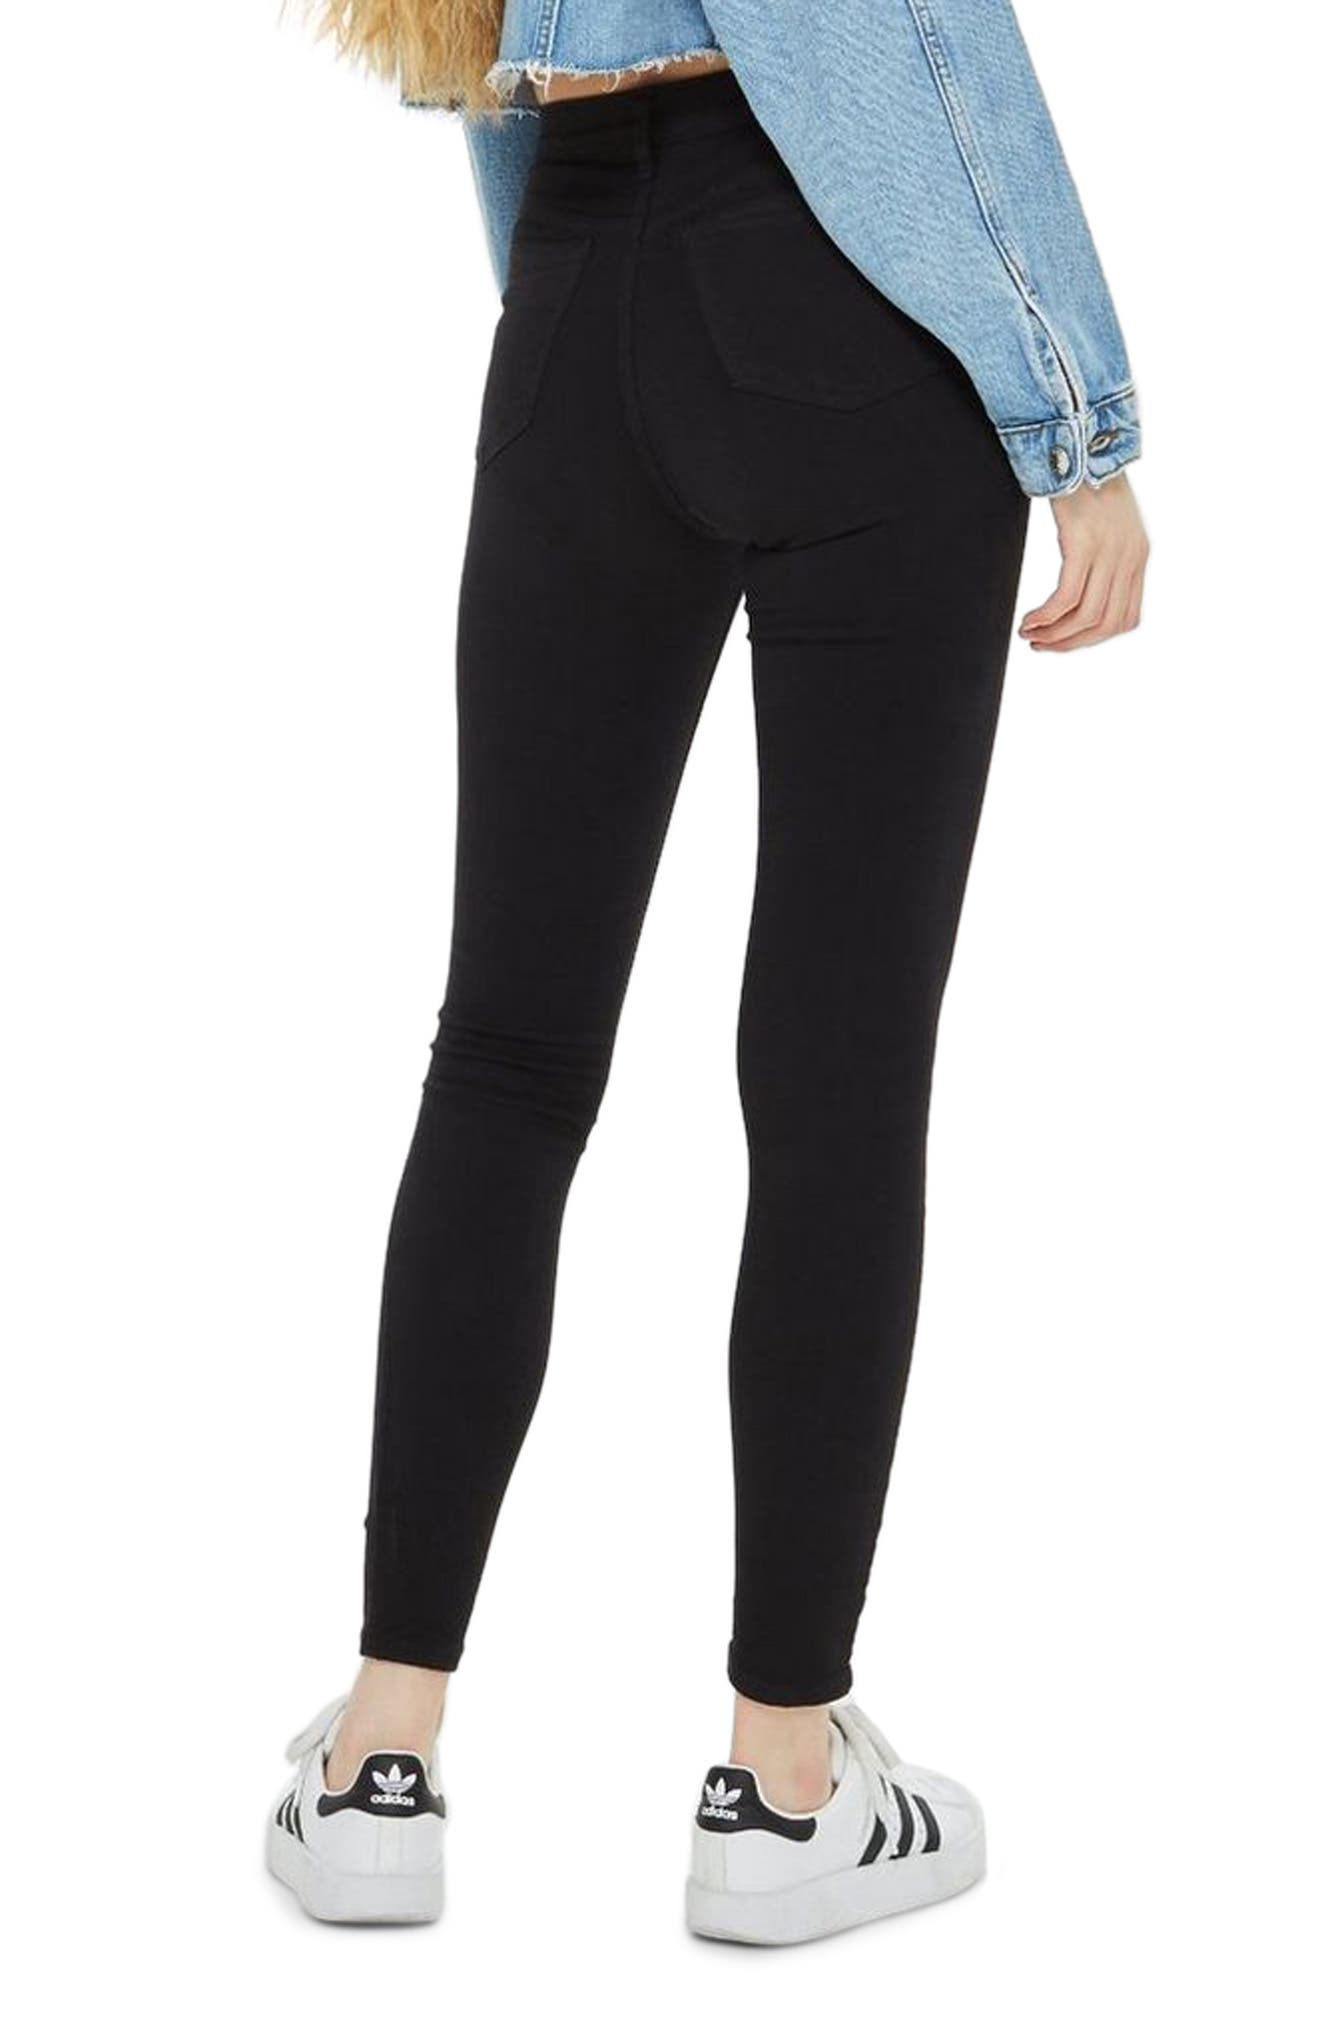 TOPSHOP, Moto Jamie High Waist Ripped Black Jeans, Alternate thumbnail 2, color, BLACK